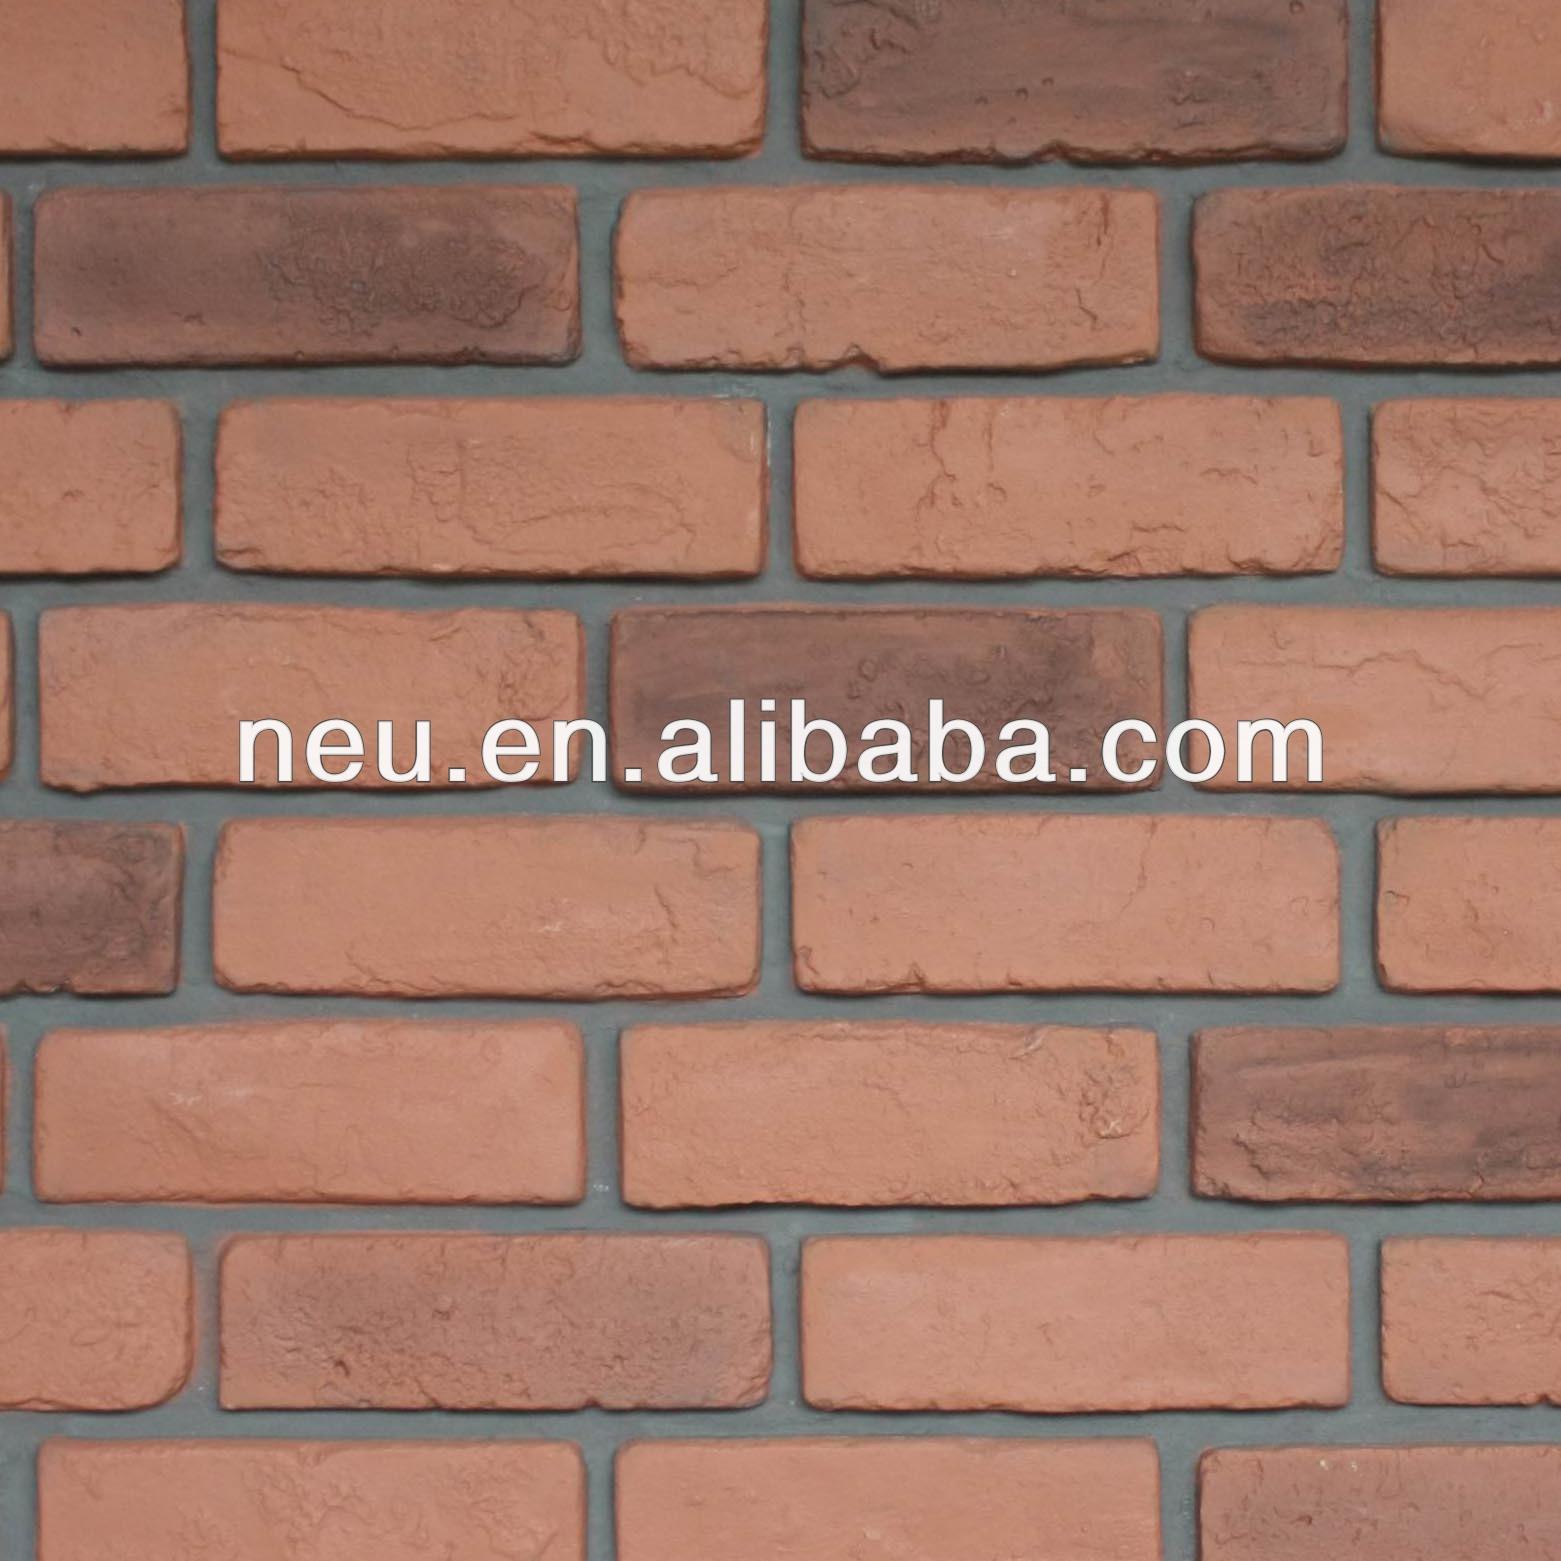 Brick wall panel - Pu Wall Panel Archaized Brick Panel Plastic Stone Wall Mixed Color Plastic Wall Red Brick Wall Buy Decorative Stone Wall Panels Fake Brick Wall Brick